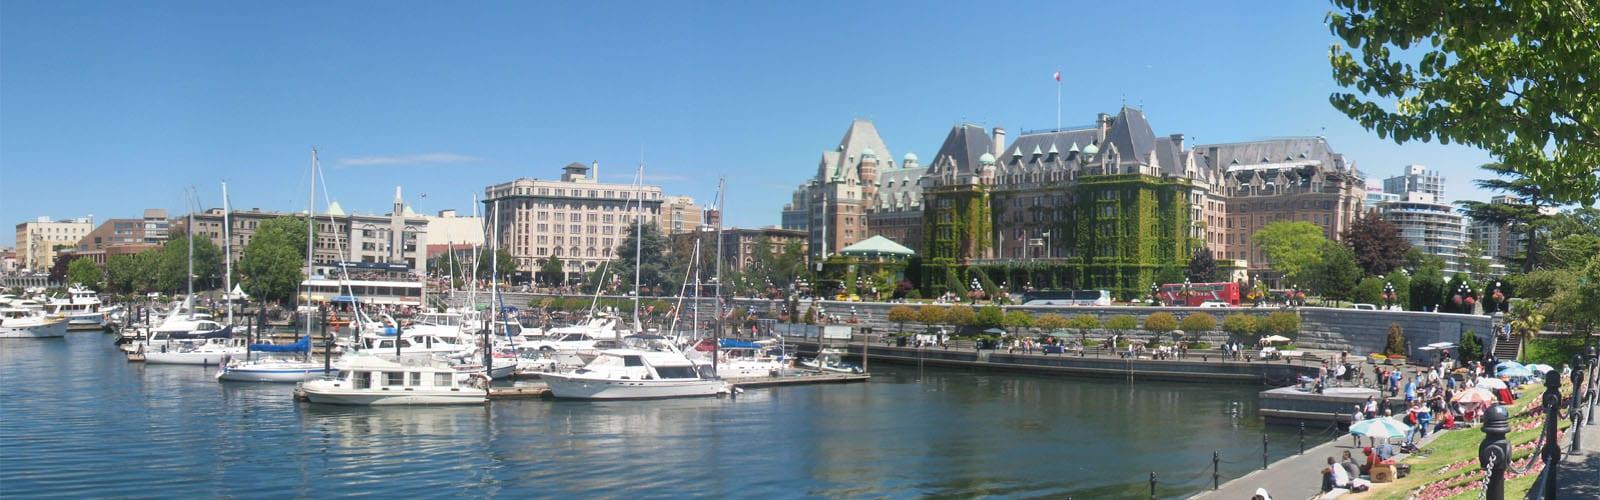 Victoria - Inner Harbour - Fairmont Empress Hotel (Mark Ruthenberg)